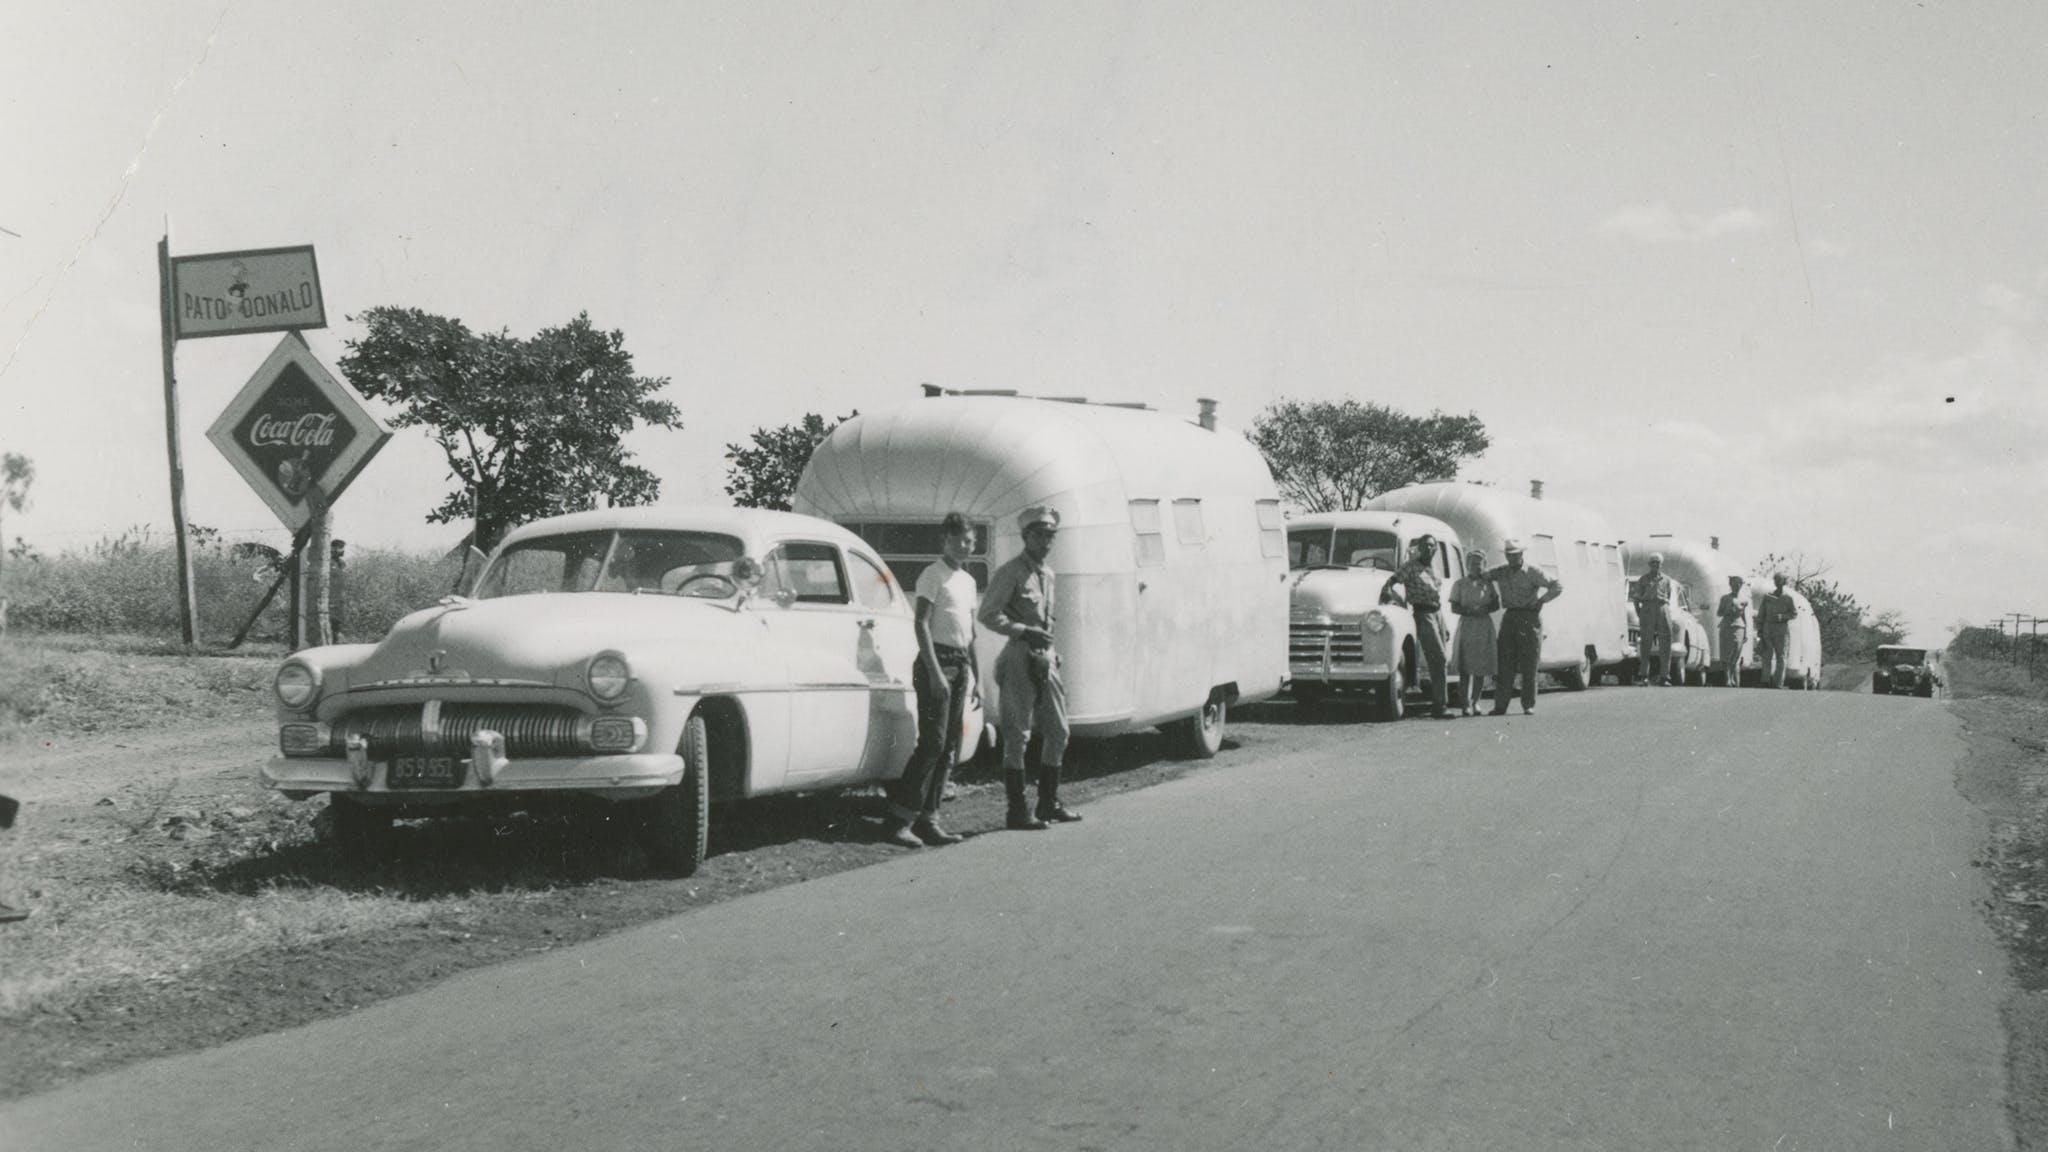 Airstream-Wally-Byam-First-Caravan-Mexico-Central-America-1951-1952-Header